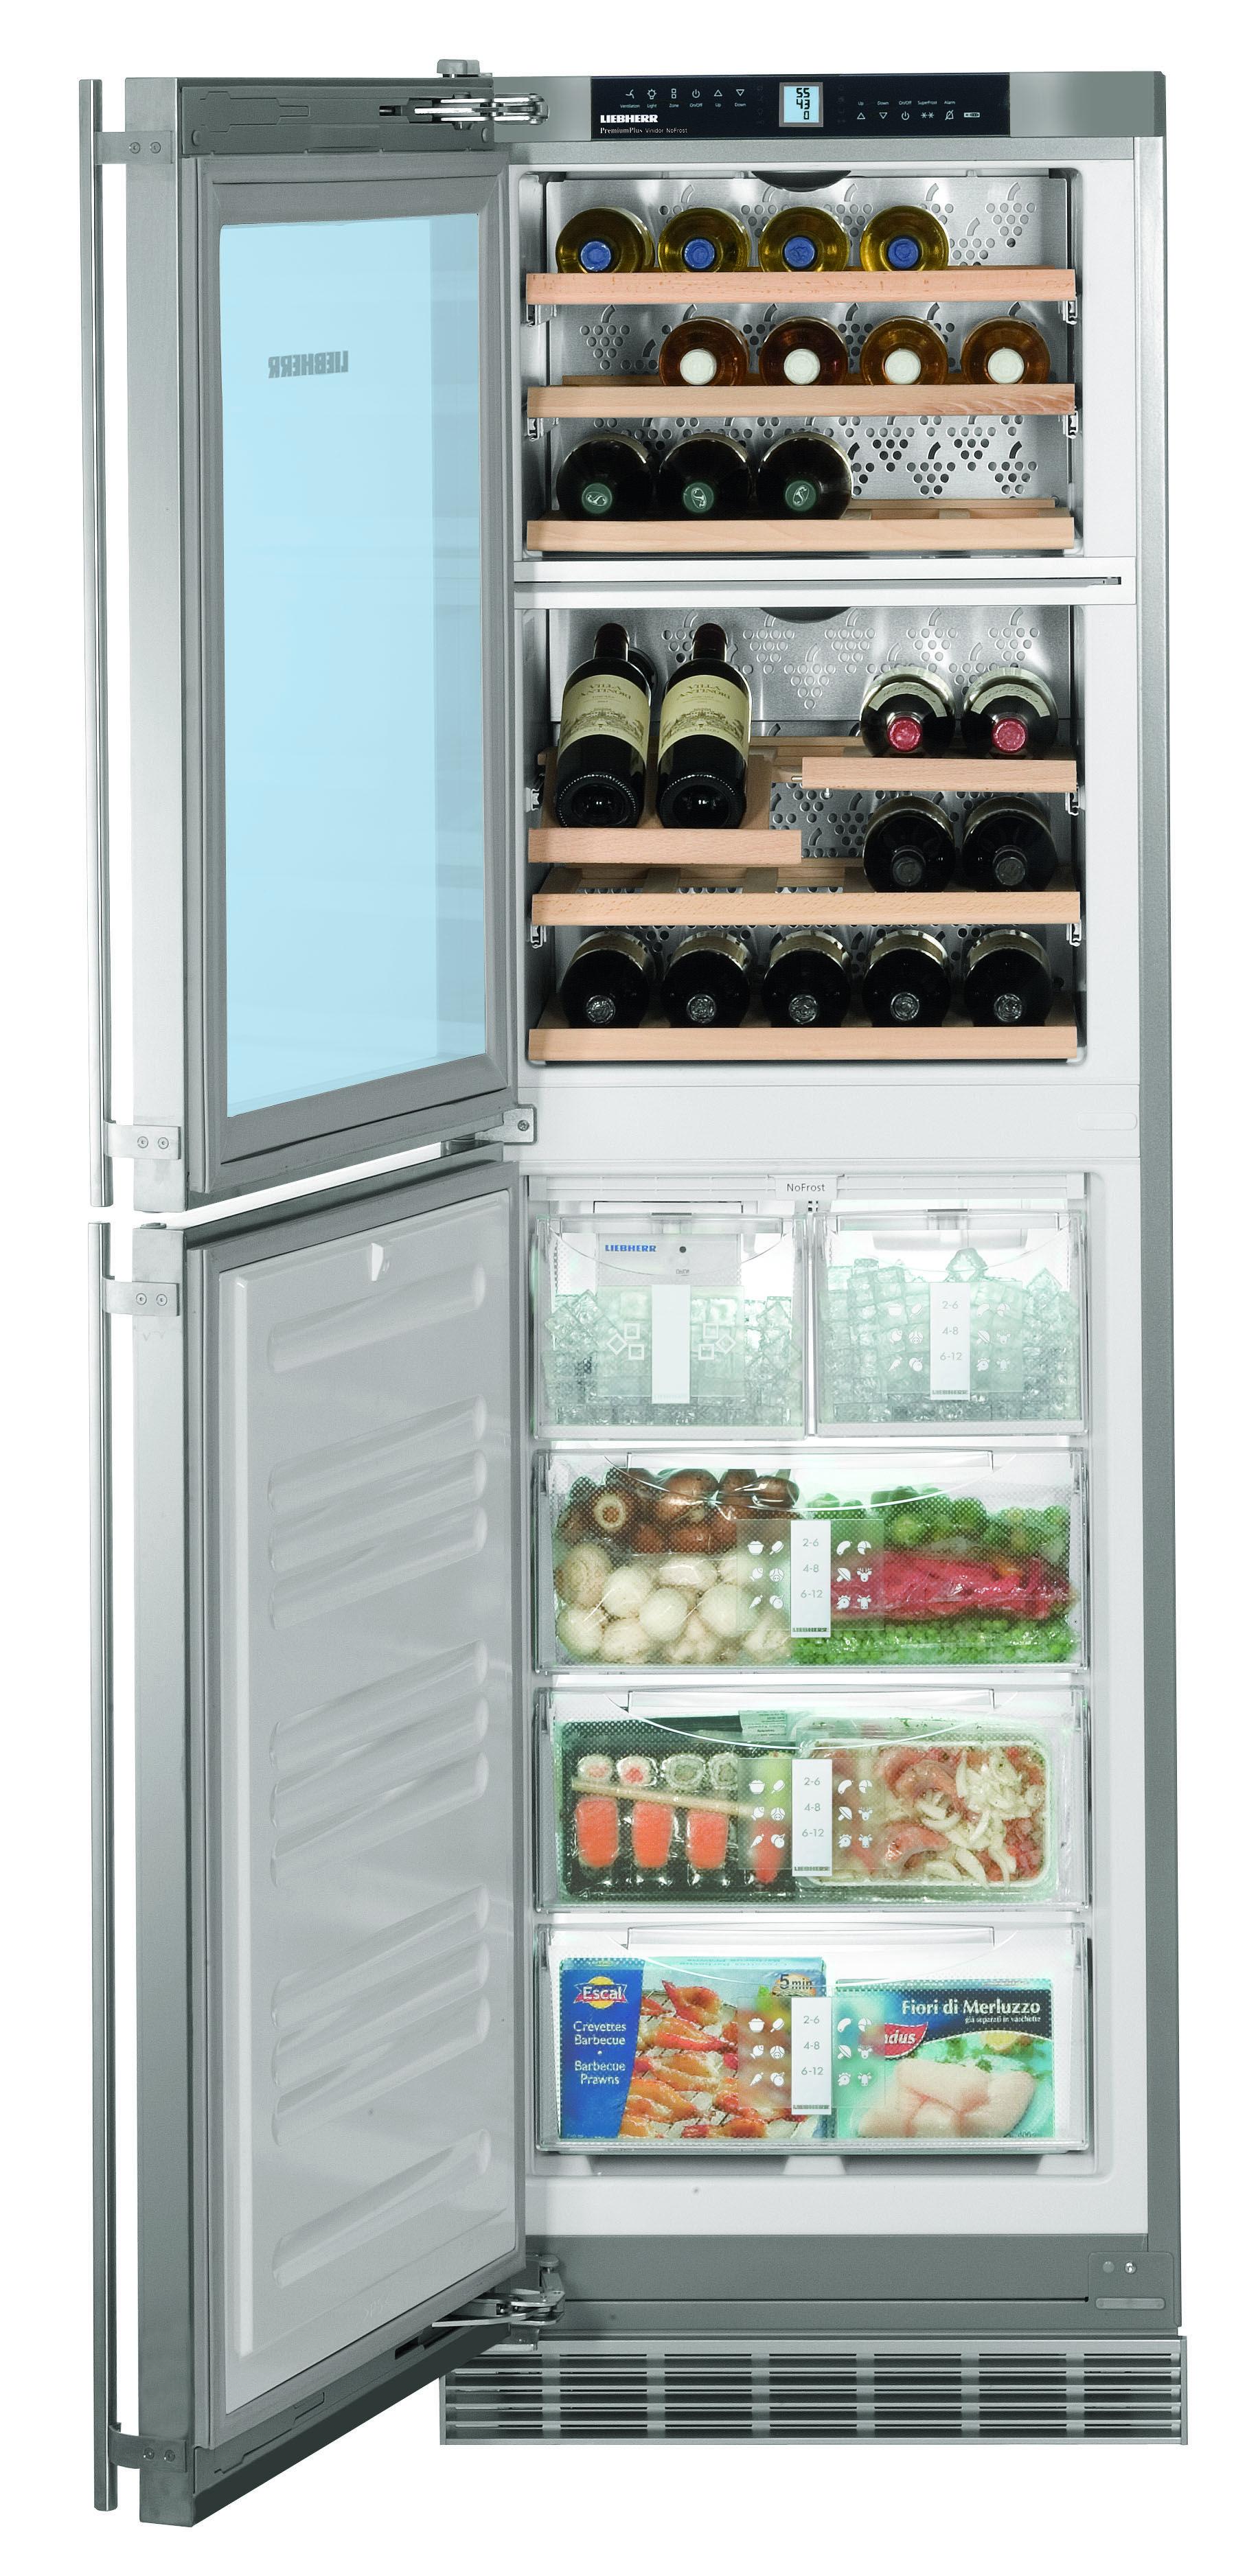 kitchenaid wine cooler thermostat